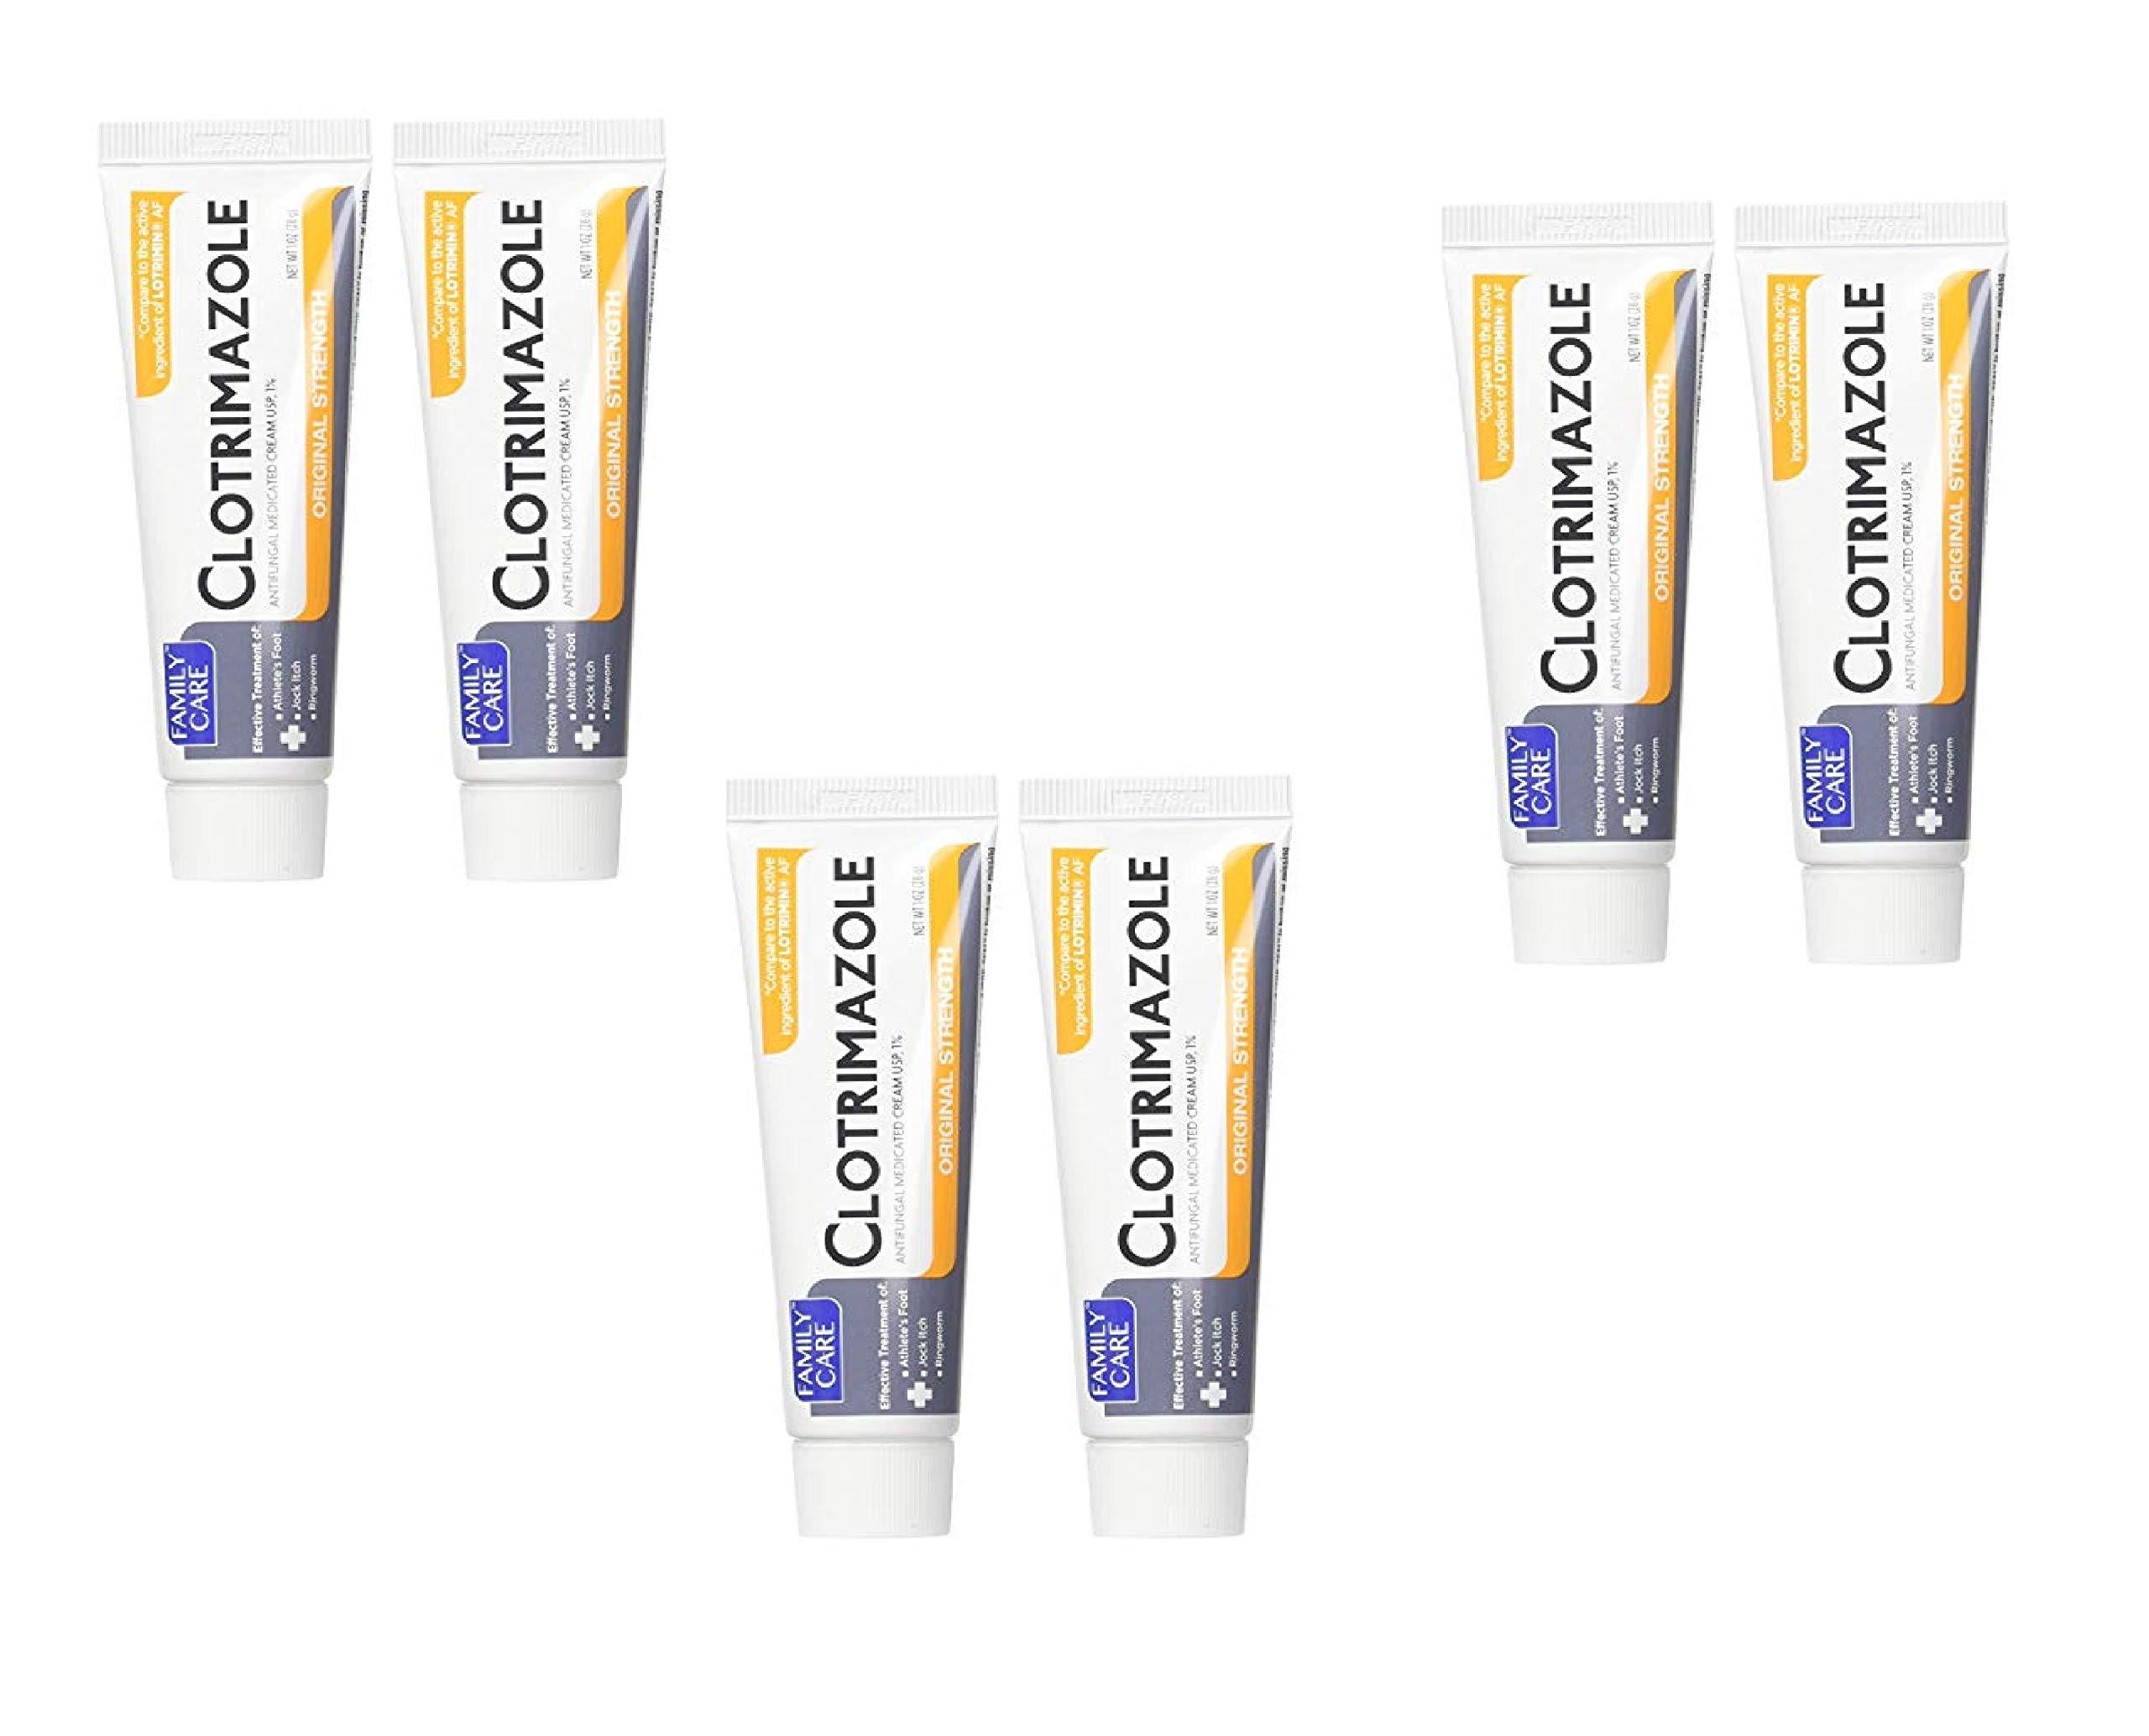 Family Care 831527005052-1 Clotrimazole Anti-Fungal Cream, 1% USP, 2 Count (3 Pack)